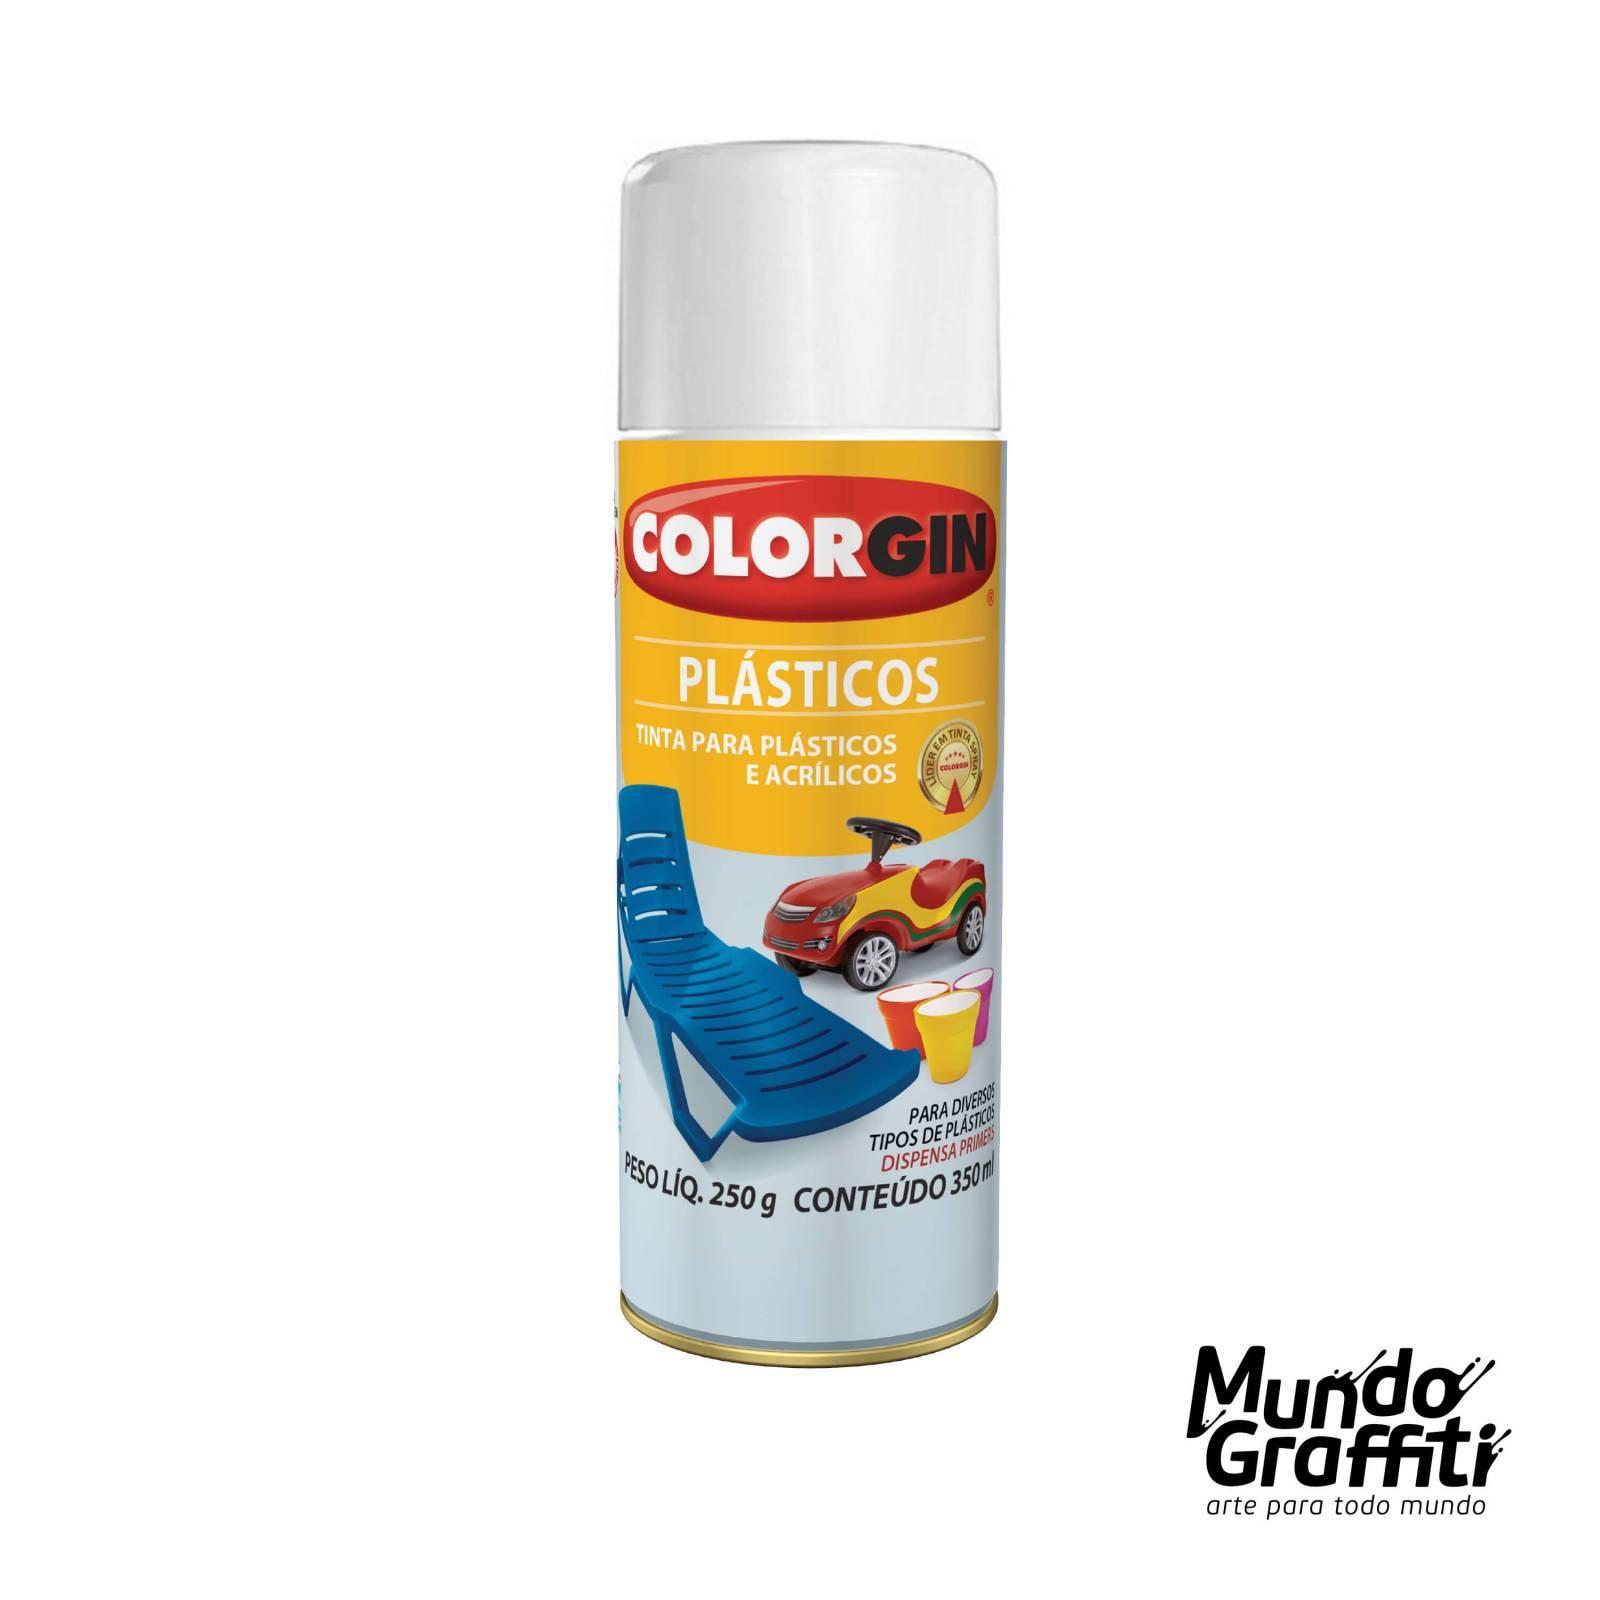 Tinta Spray Colorgin p/ Plasticos 1501 Branco Brilh. 350ml - Mundo Graffiti